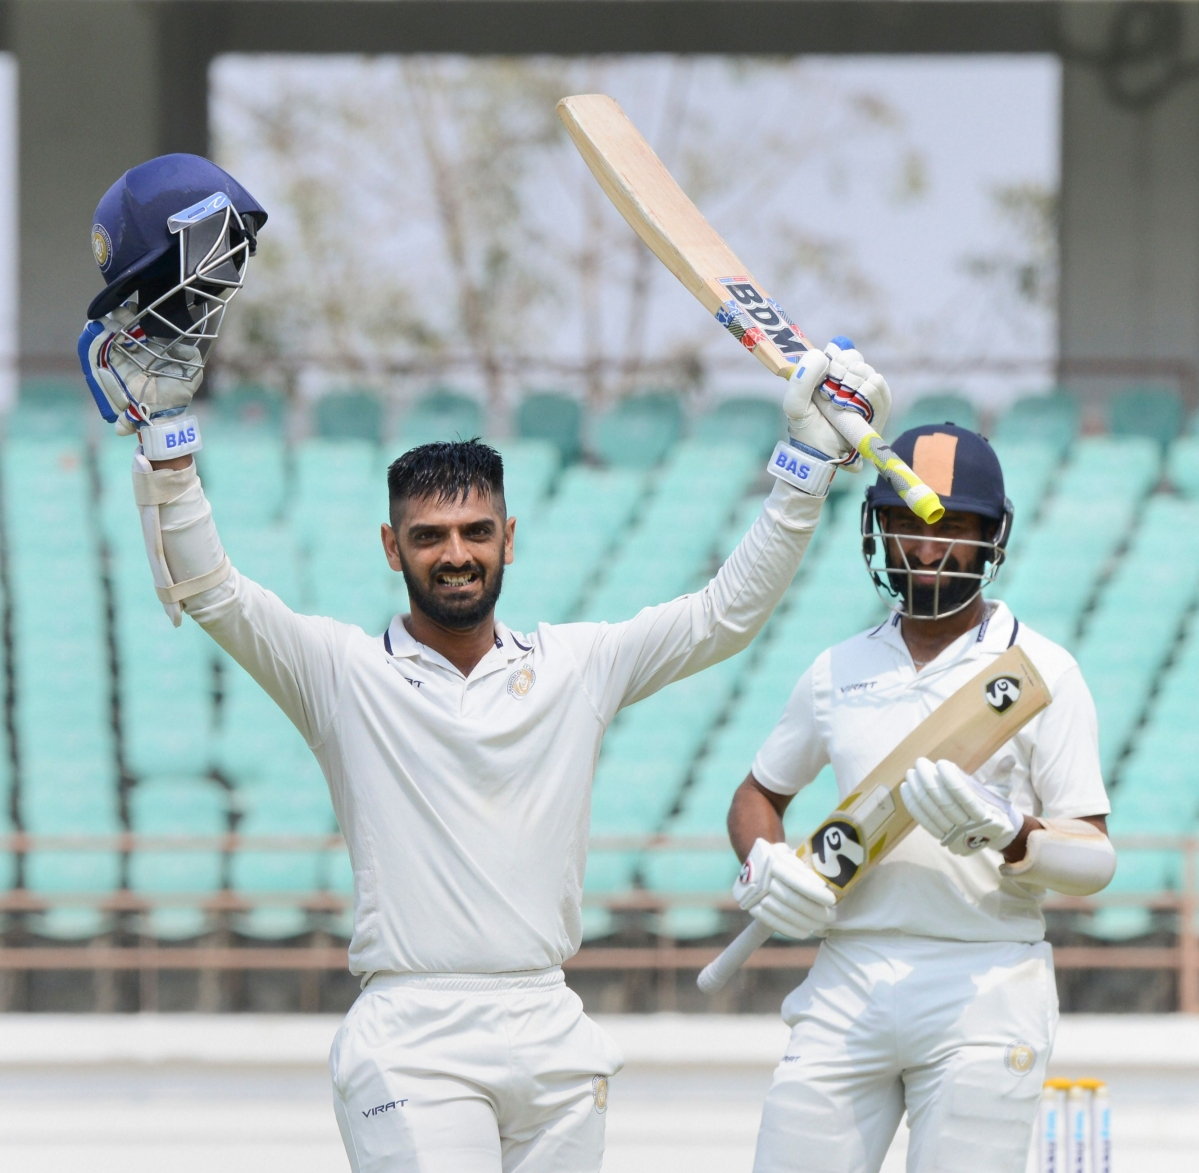 Saurashtra batsman Arpit Vasavada celebrates after scoring 100 runs during the Ranji final match against Bengal in Rajkot on Tuesday.